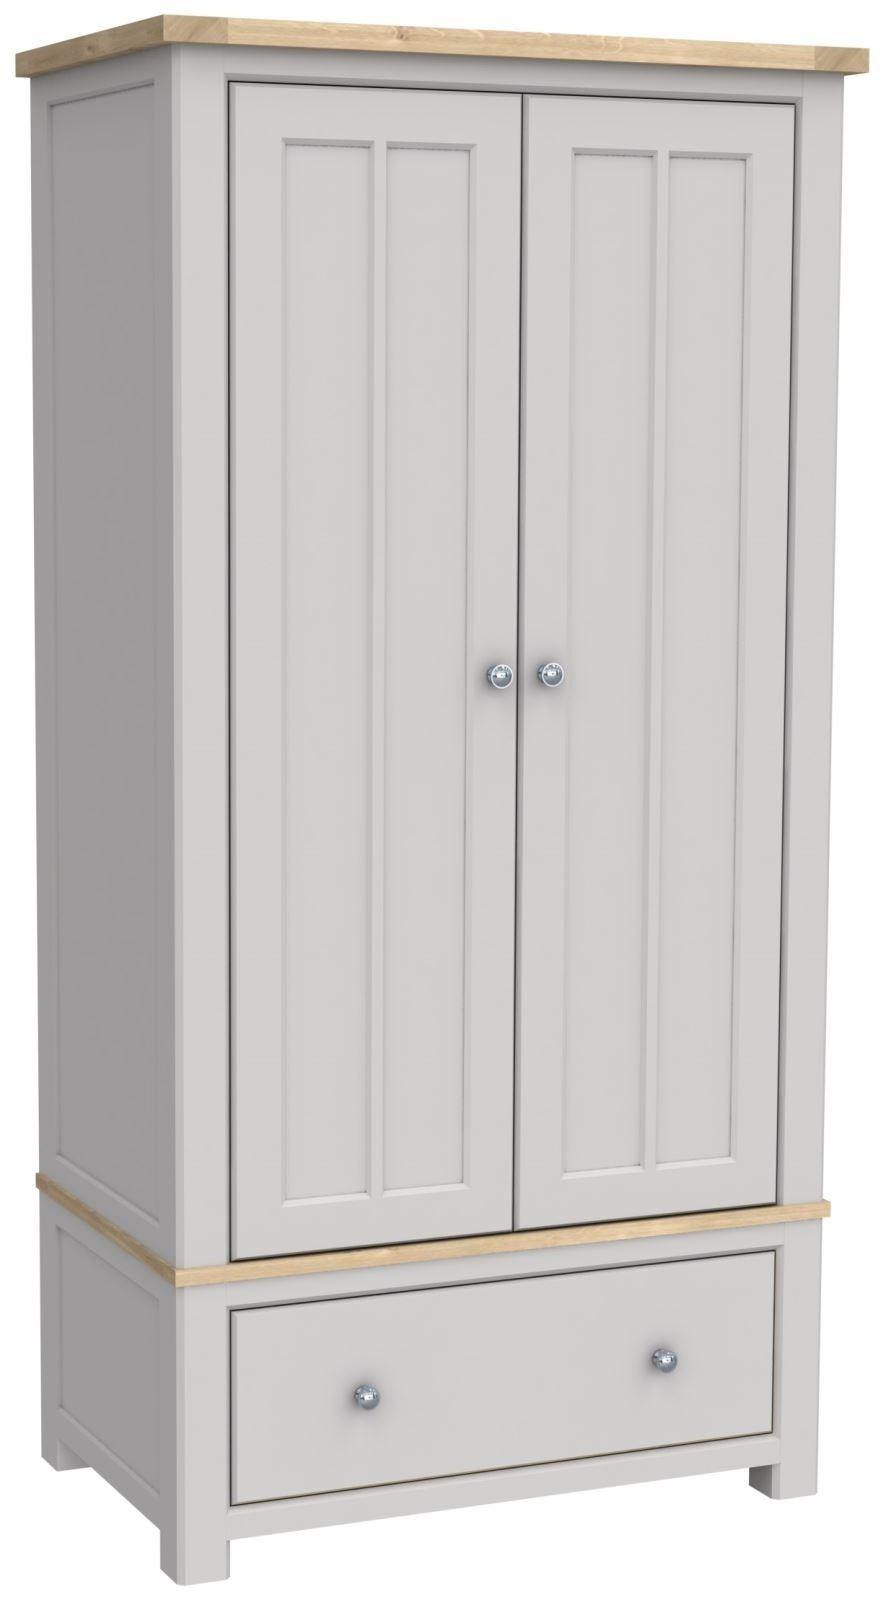 Greystone Grey Painted W White Washed Oak Top Gents 2 Door Wardrobe W Drawer Progressive Furnishings